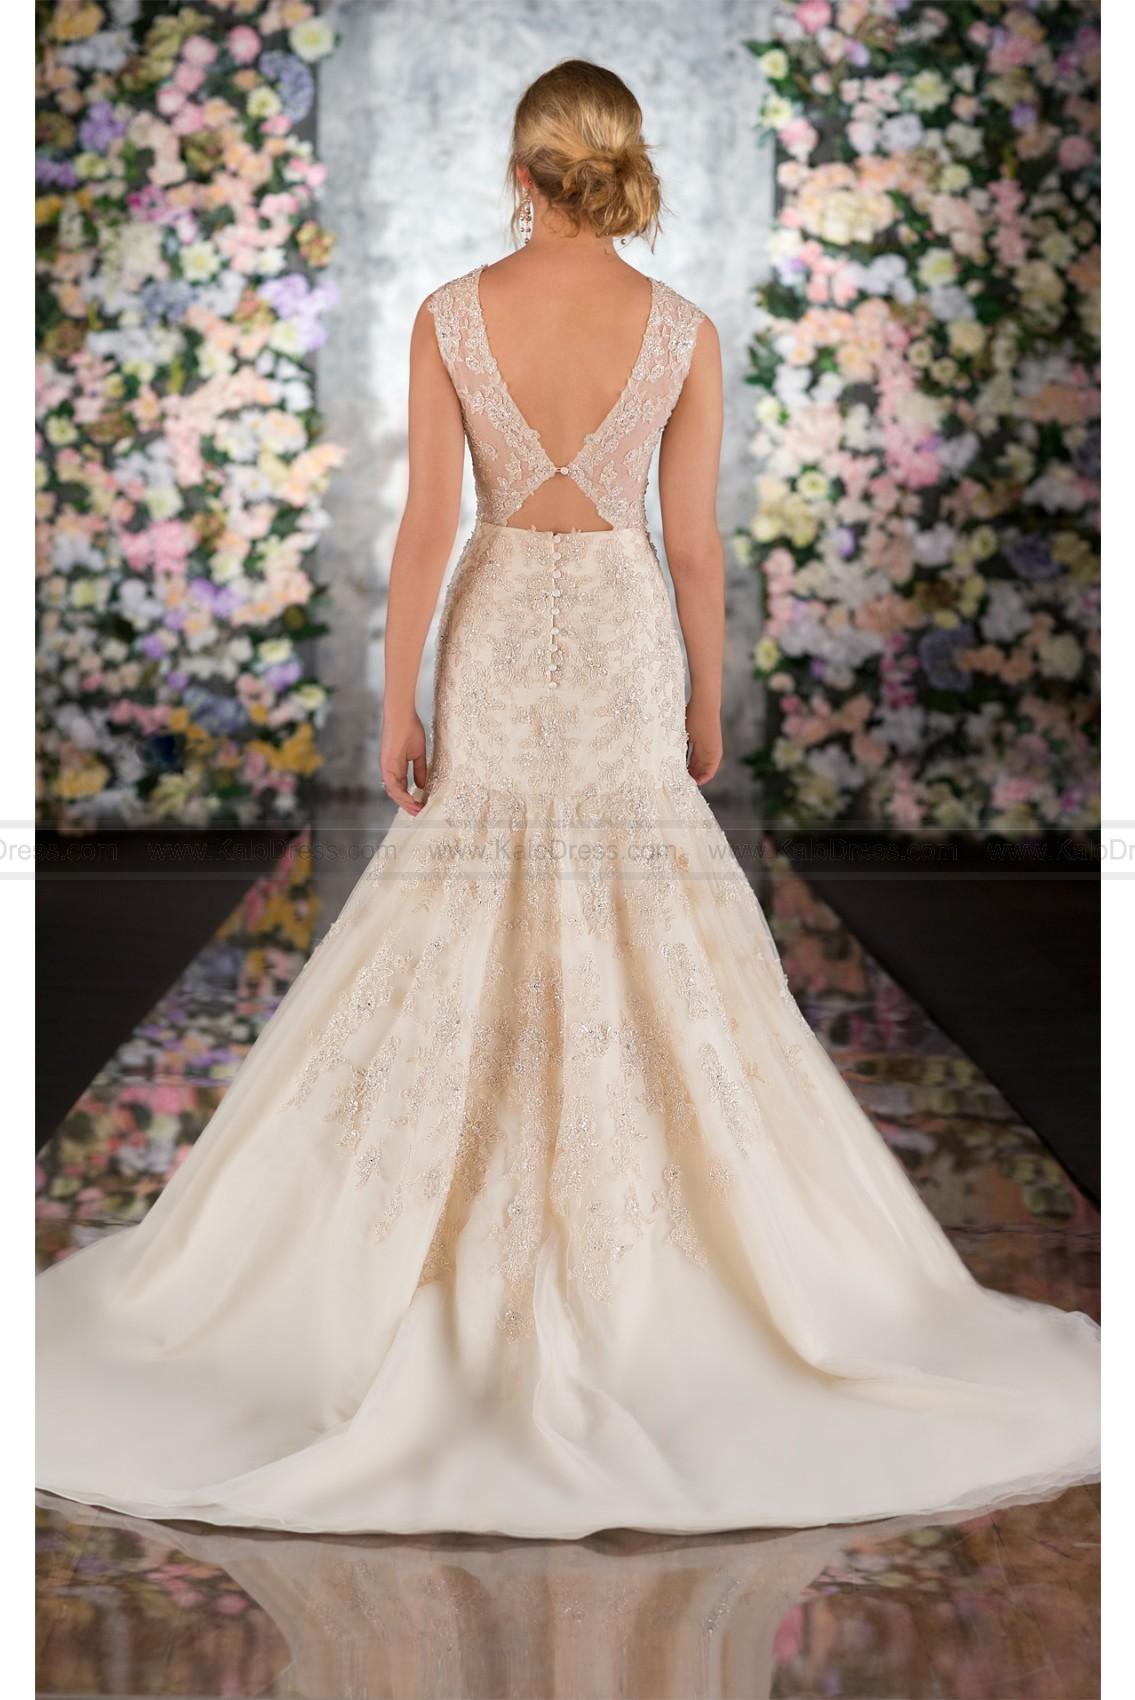 Martina Liana Style 544 - Wedding Dresses 2014 New - Formal Wedding Dresses